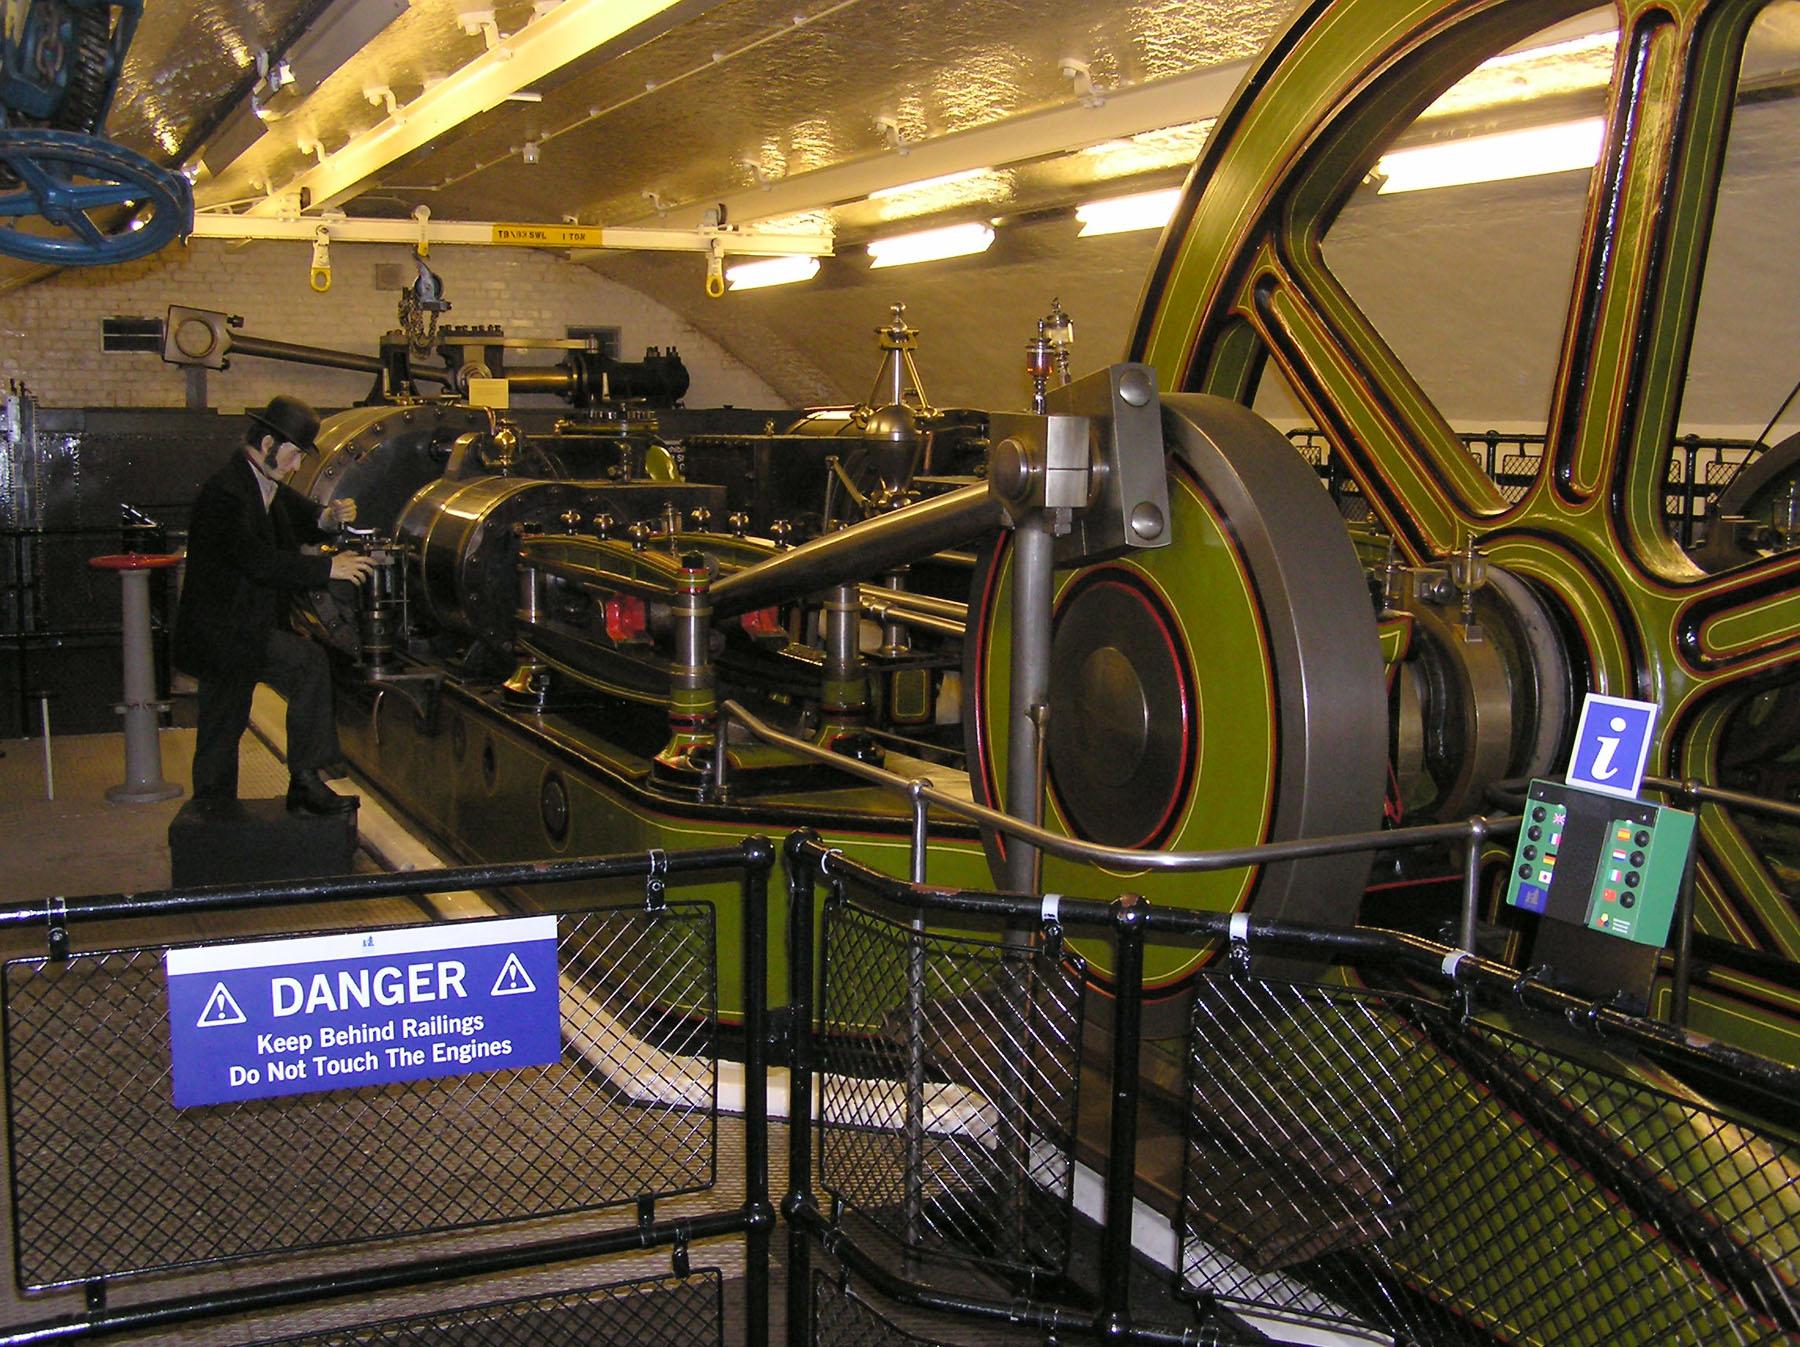 Stationary steam engine - Wikipedia